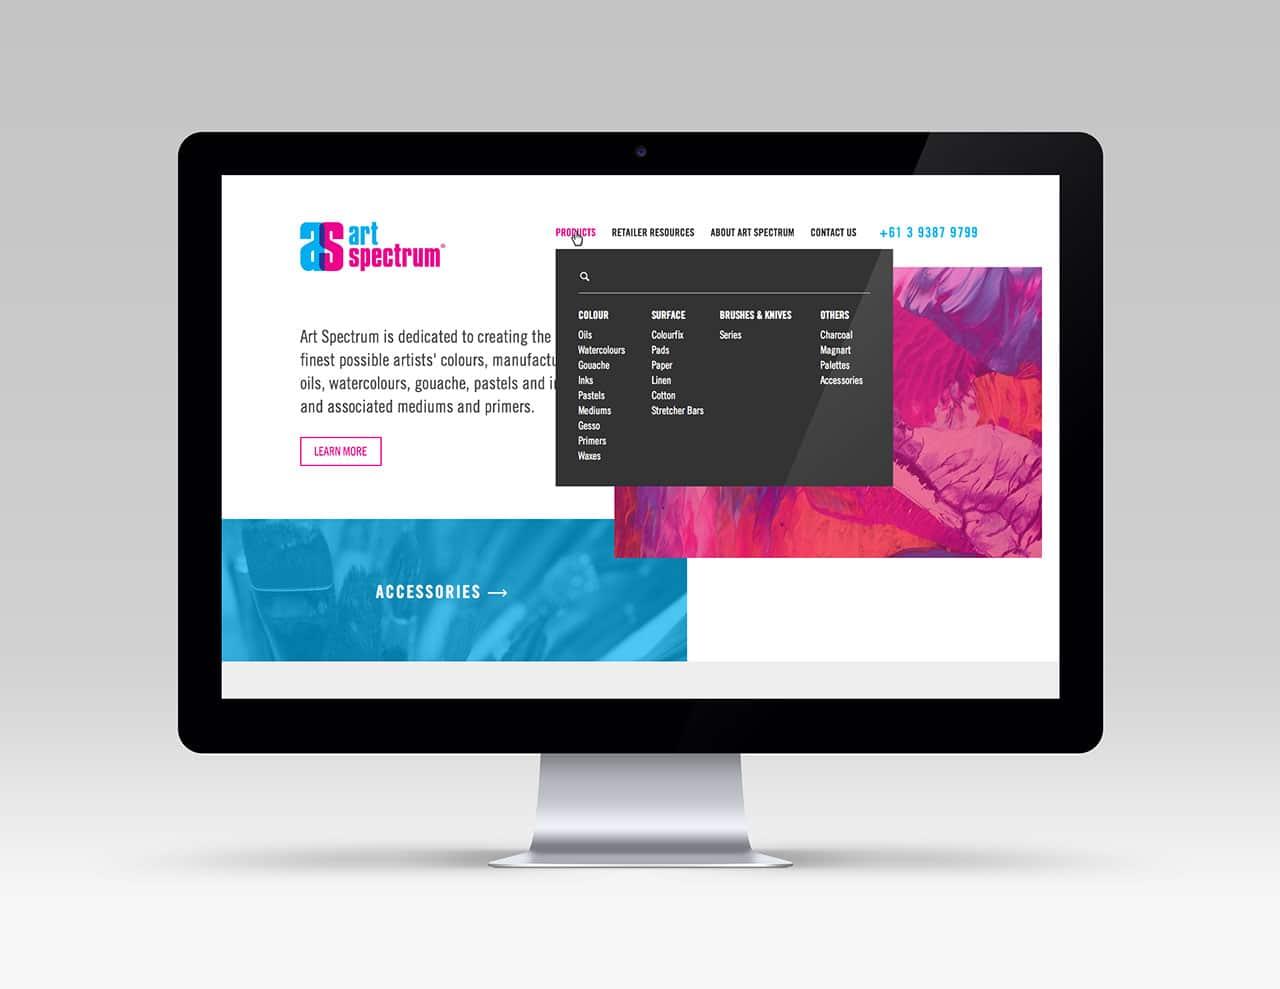 Art Spectrum homepage desktop design on iMac